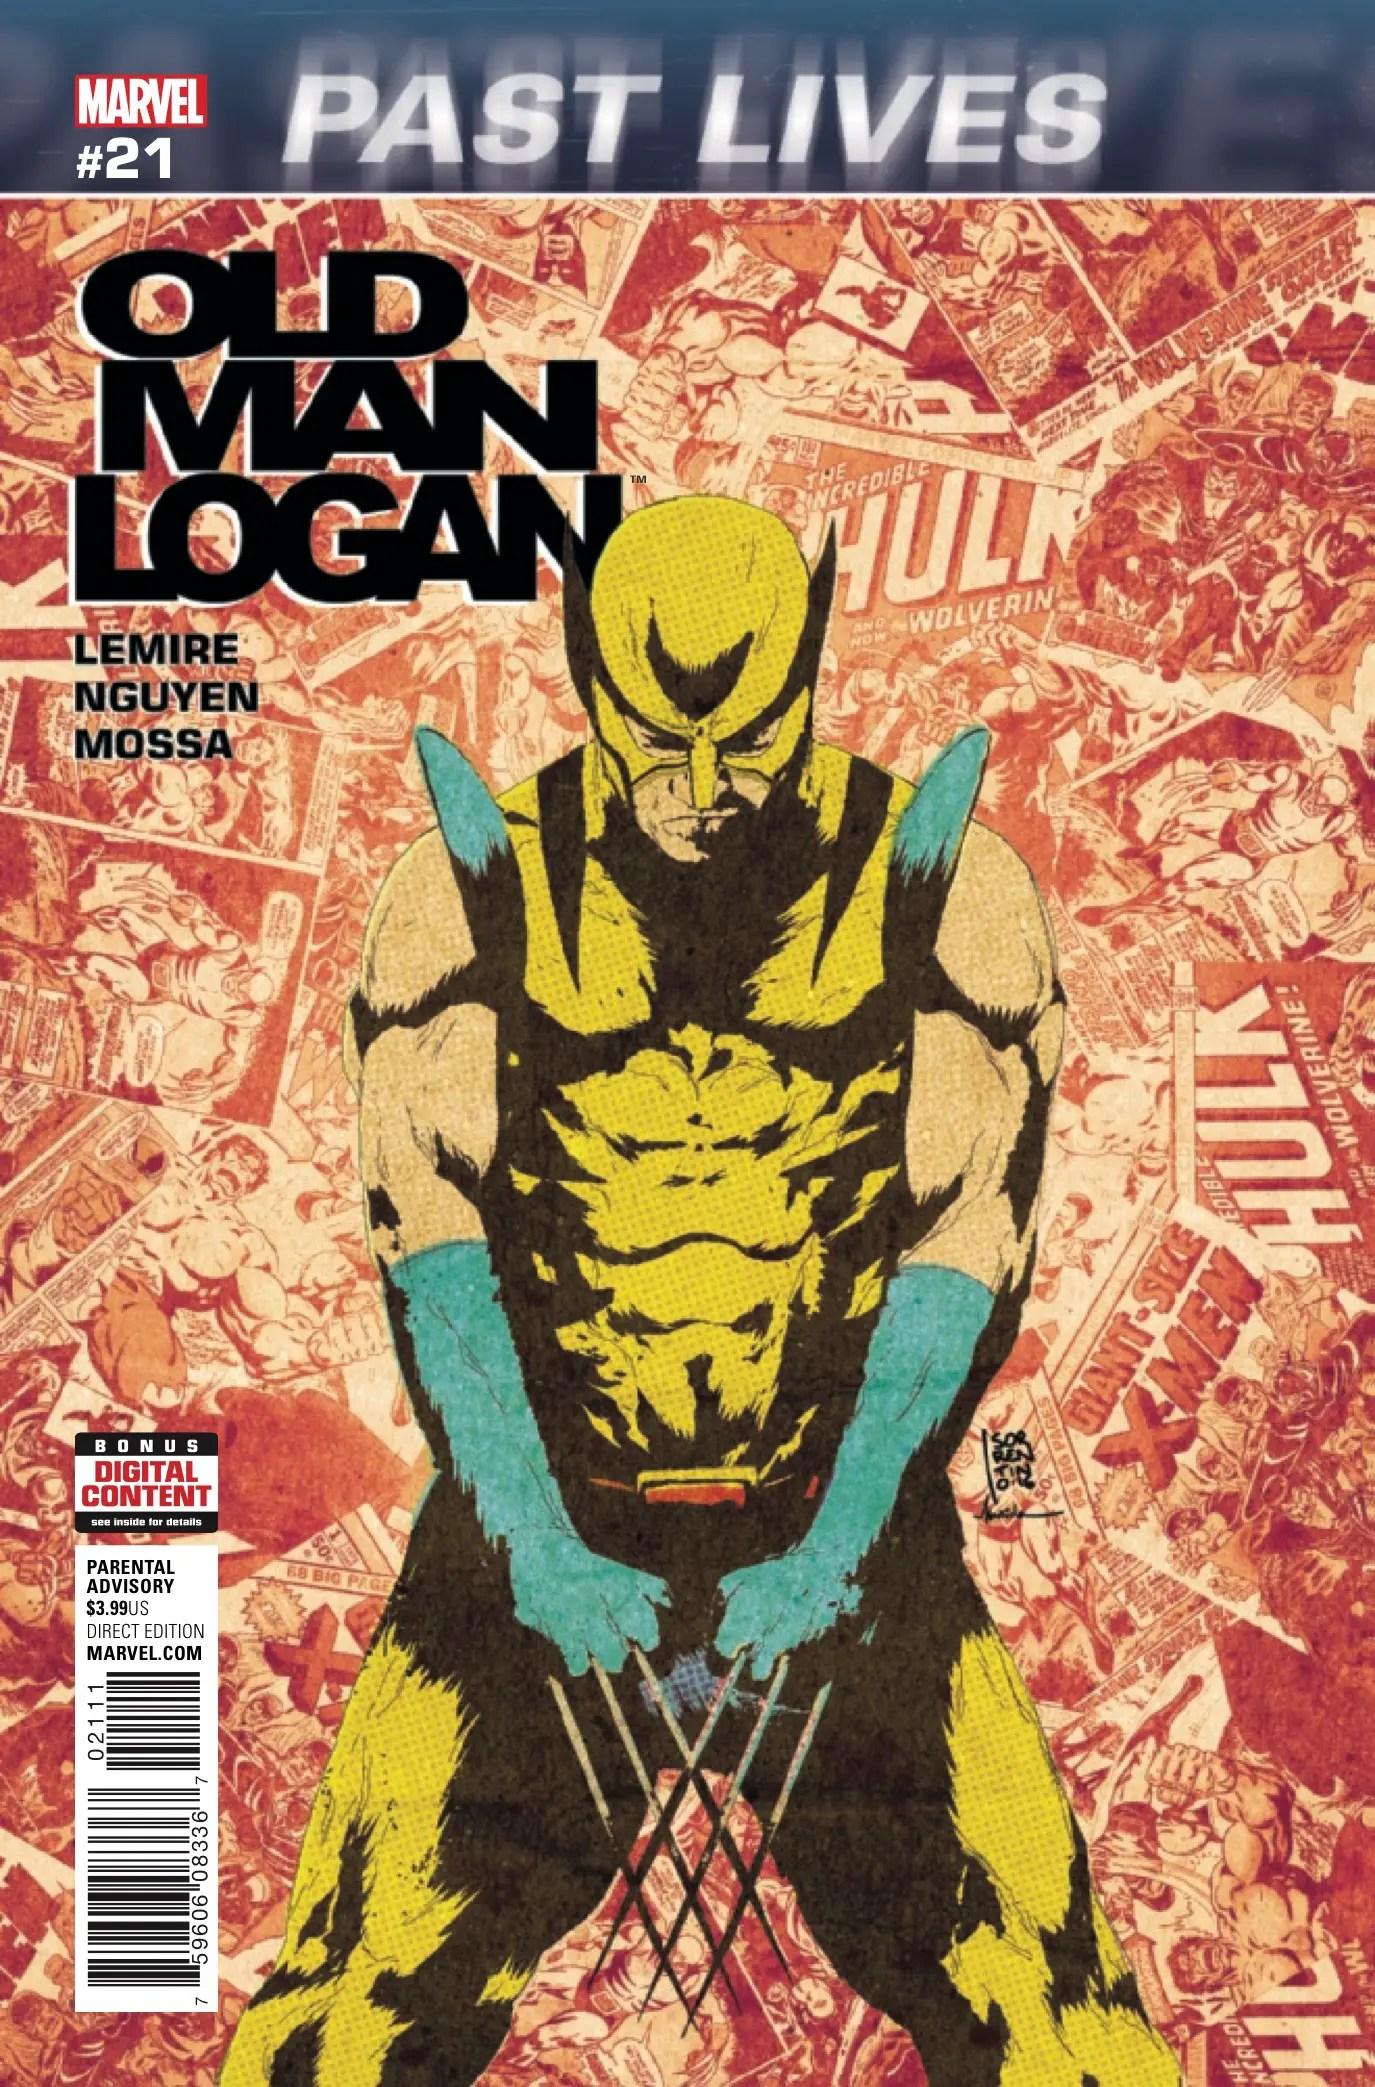 Old Man Logan #21 Review